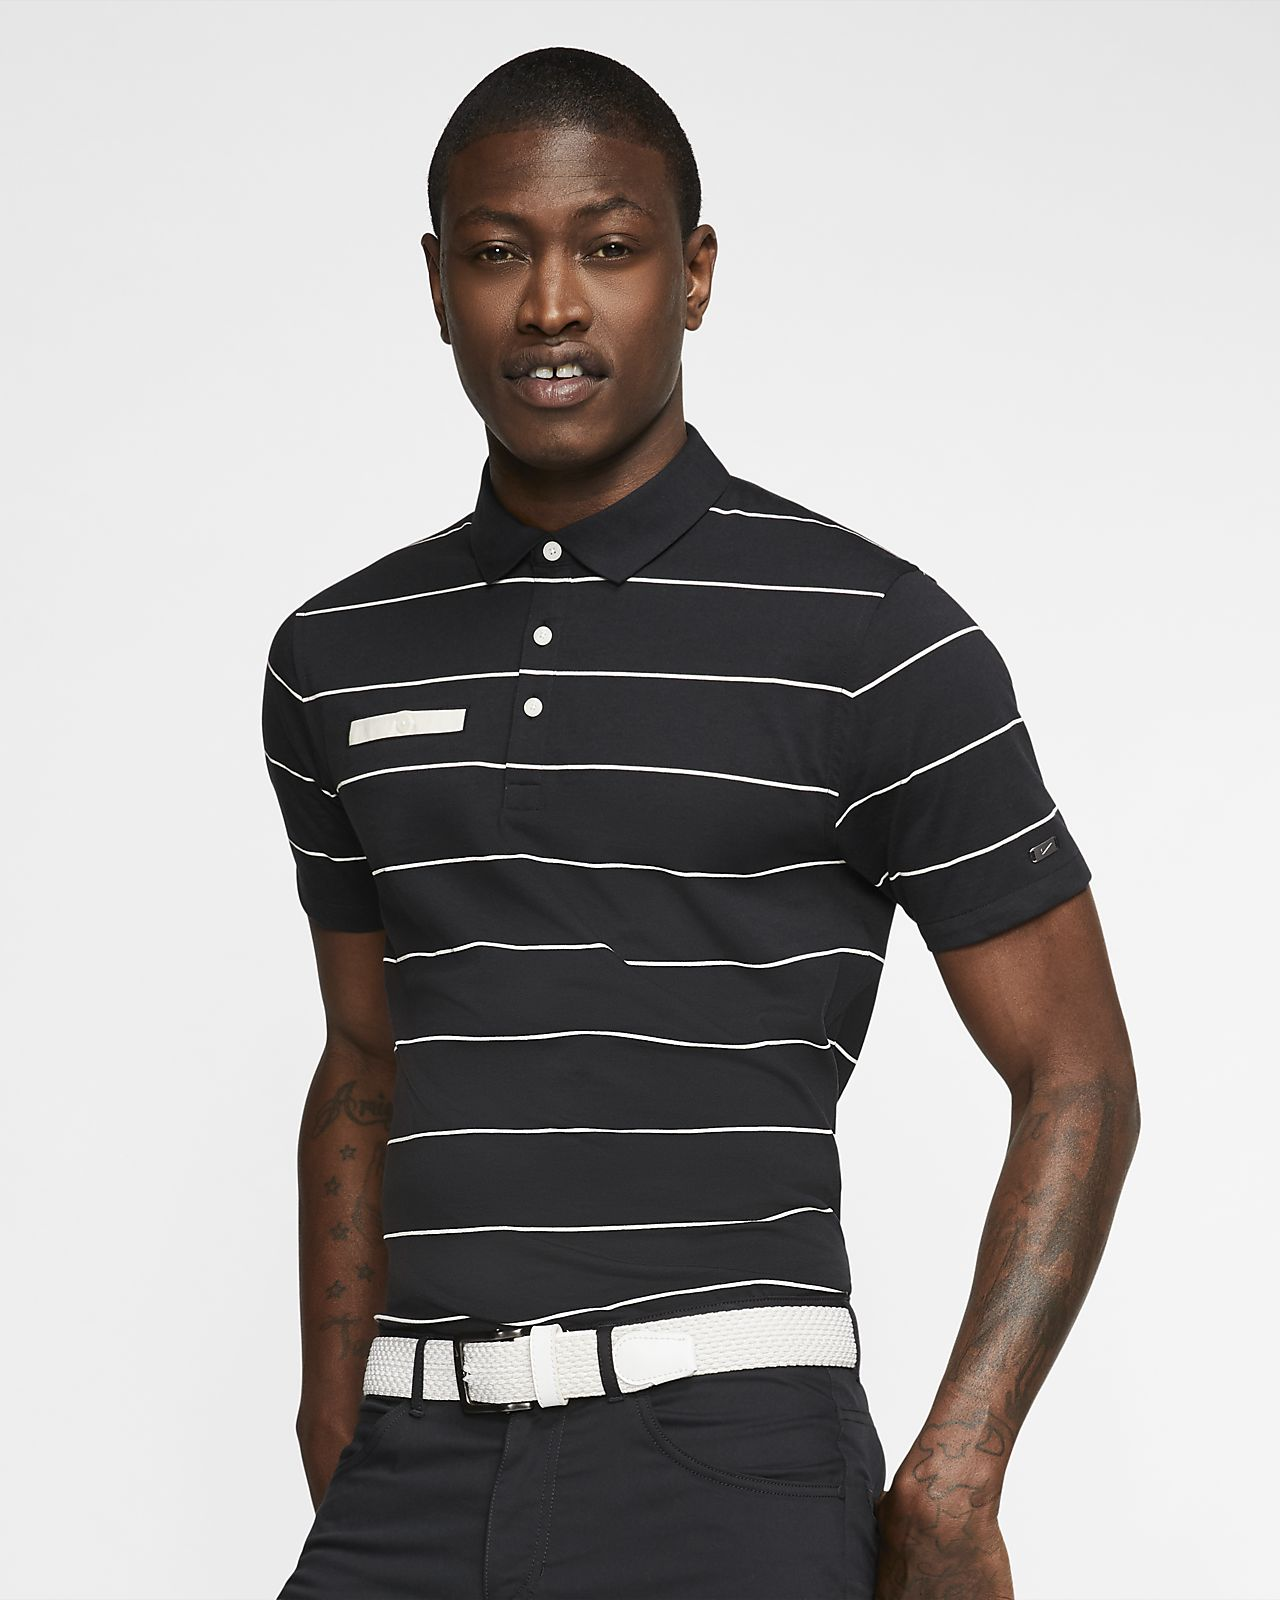 bcff760b9 Nike Dri-FIT Player Men s Striped Golf Polo. Nike.com MA